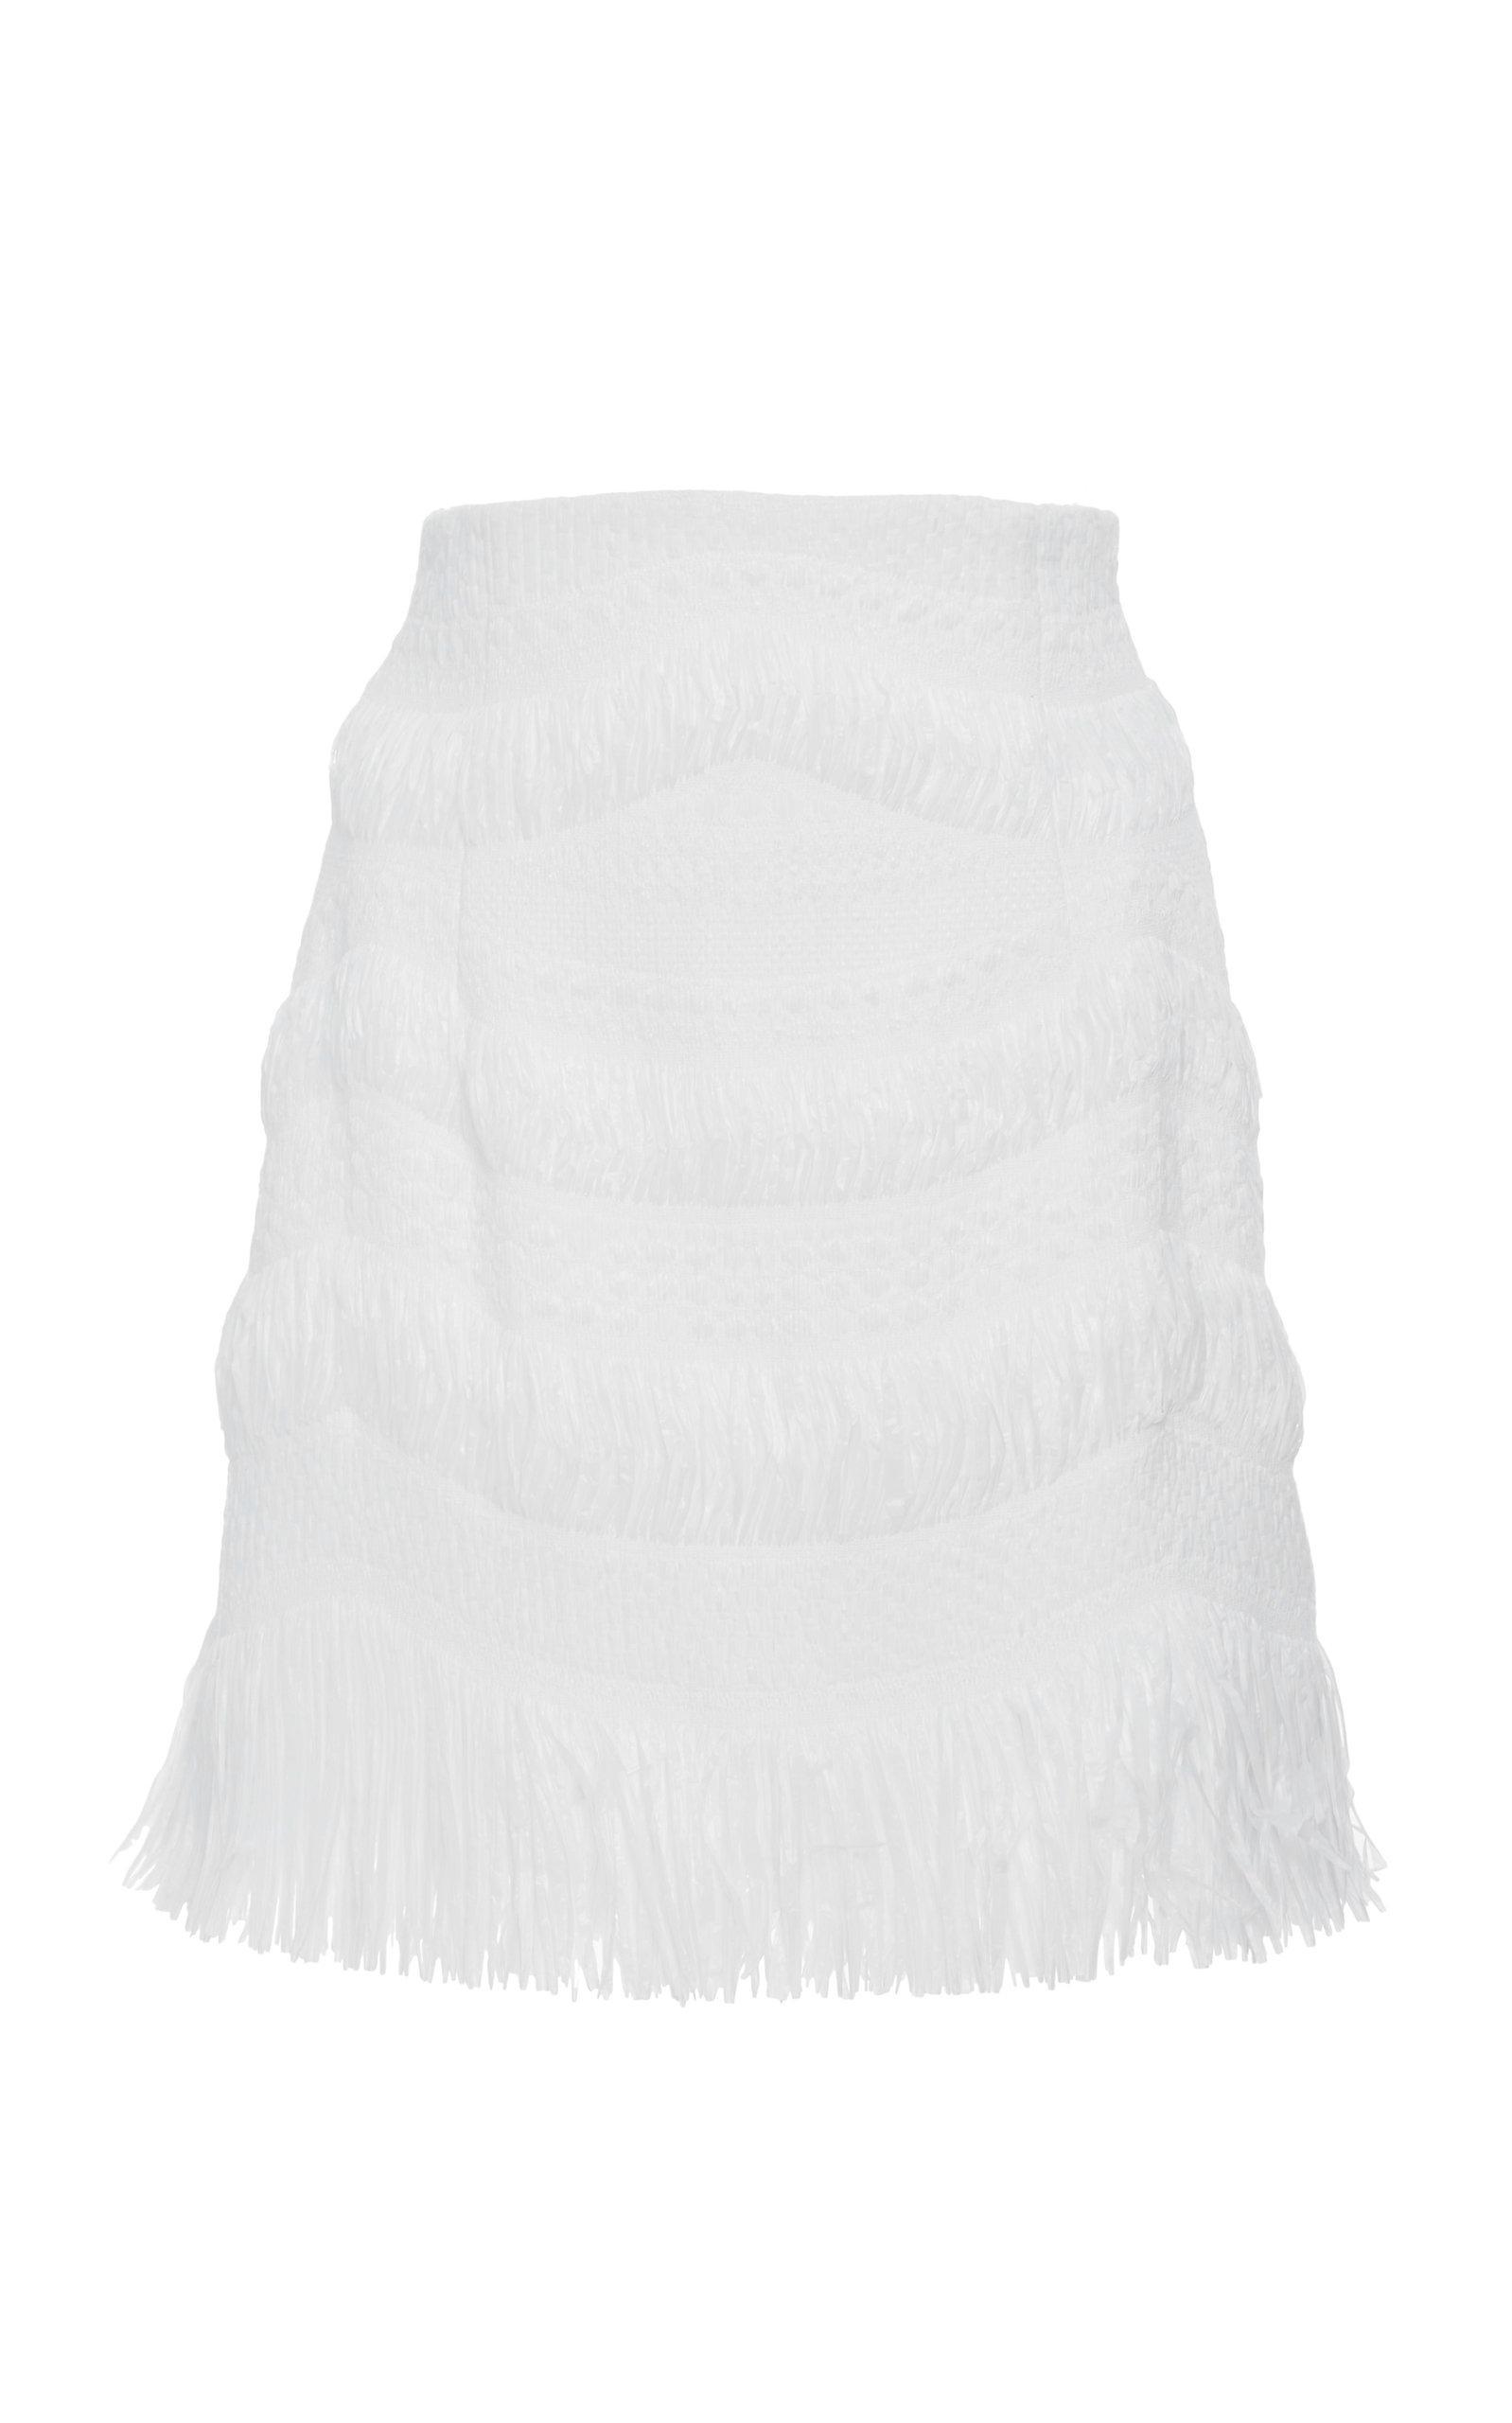 Alice Mccall Suave Skirt Porcelain? In White